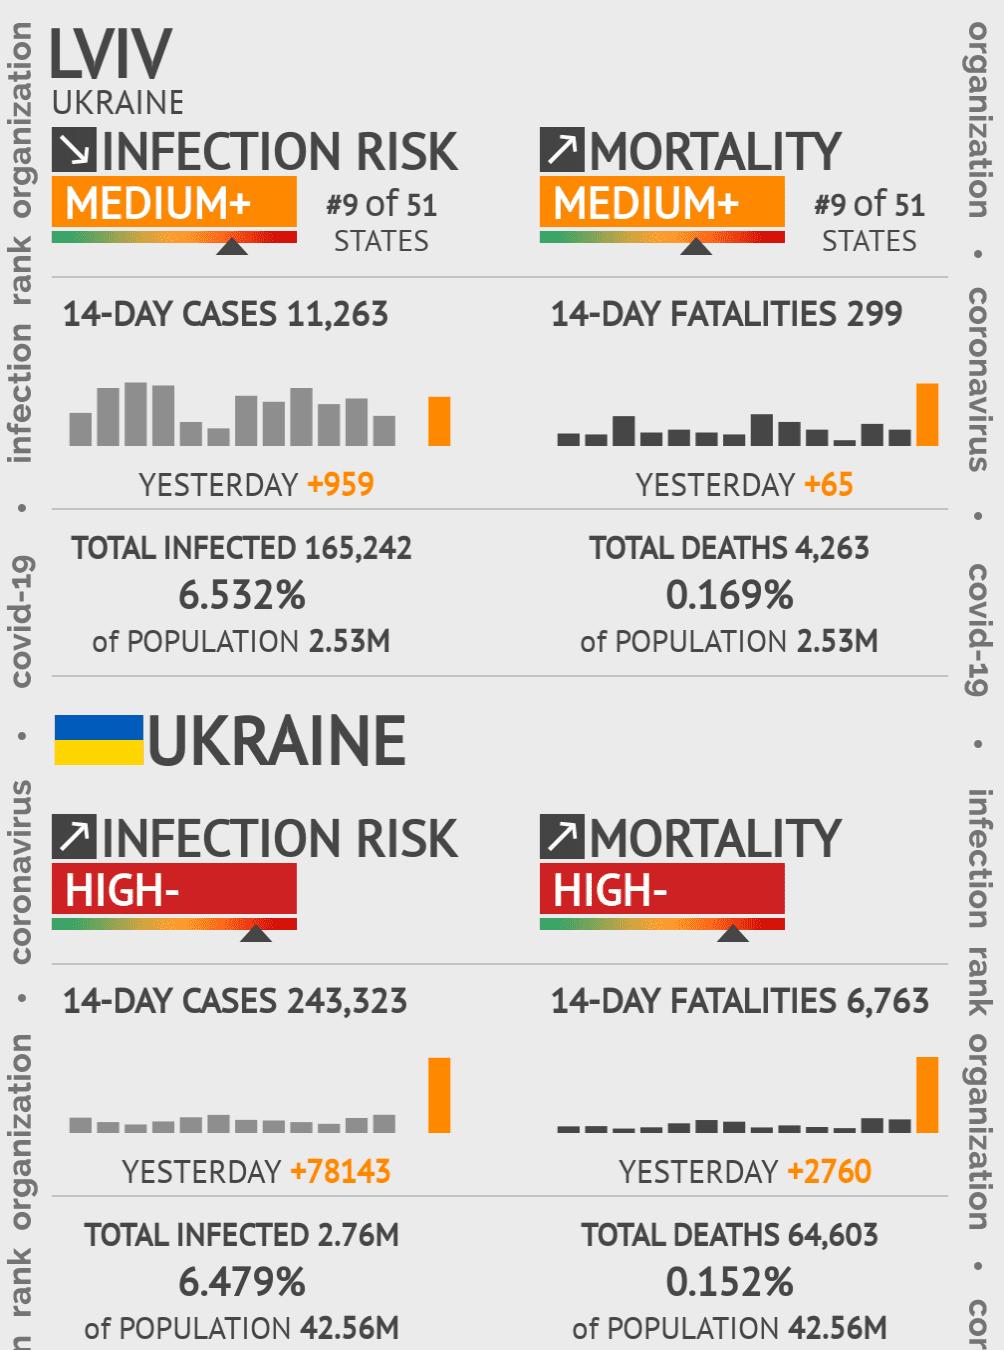 Lviv Coronavirus Covid-19 Risk of Infection on March 04, 2021